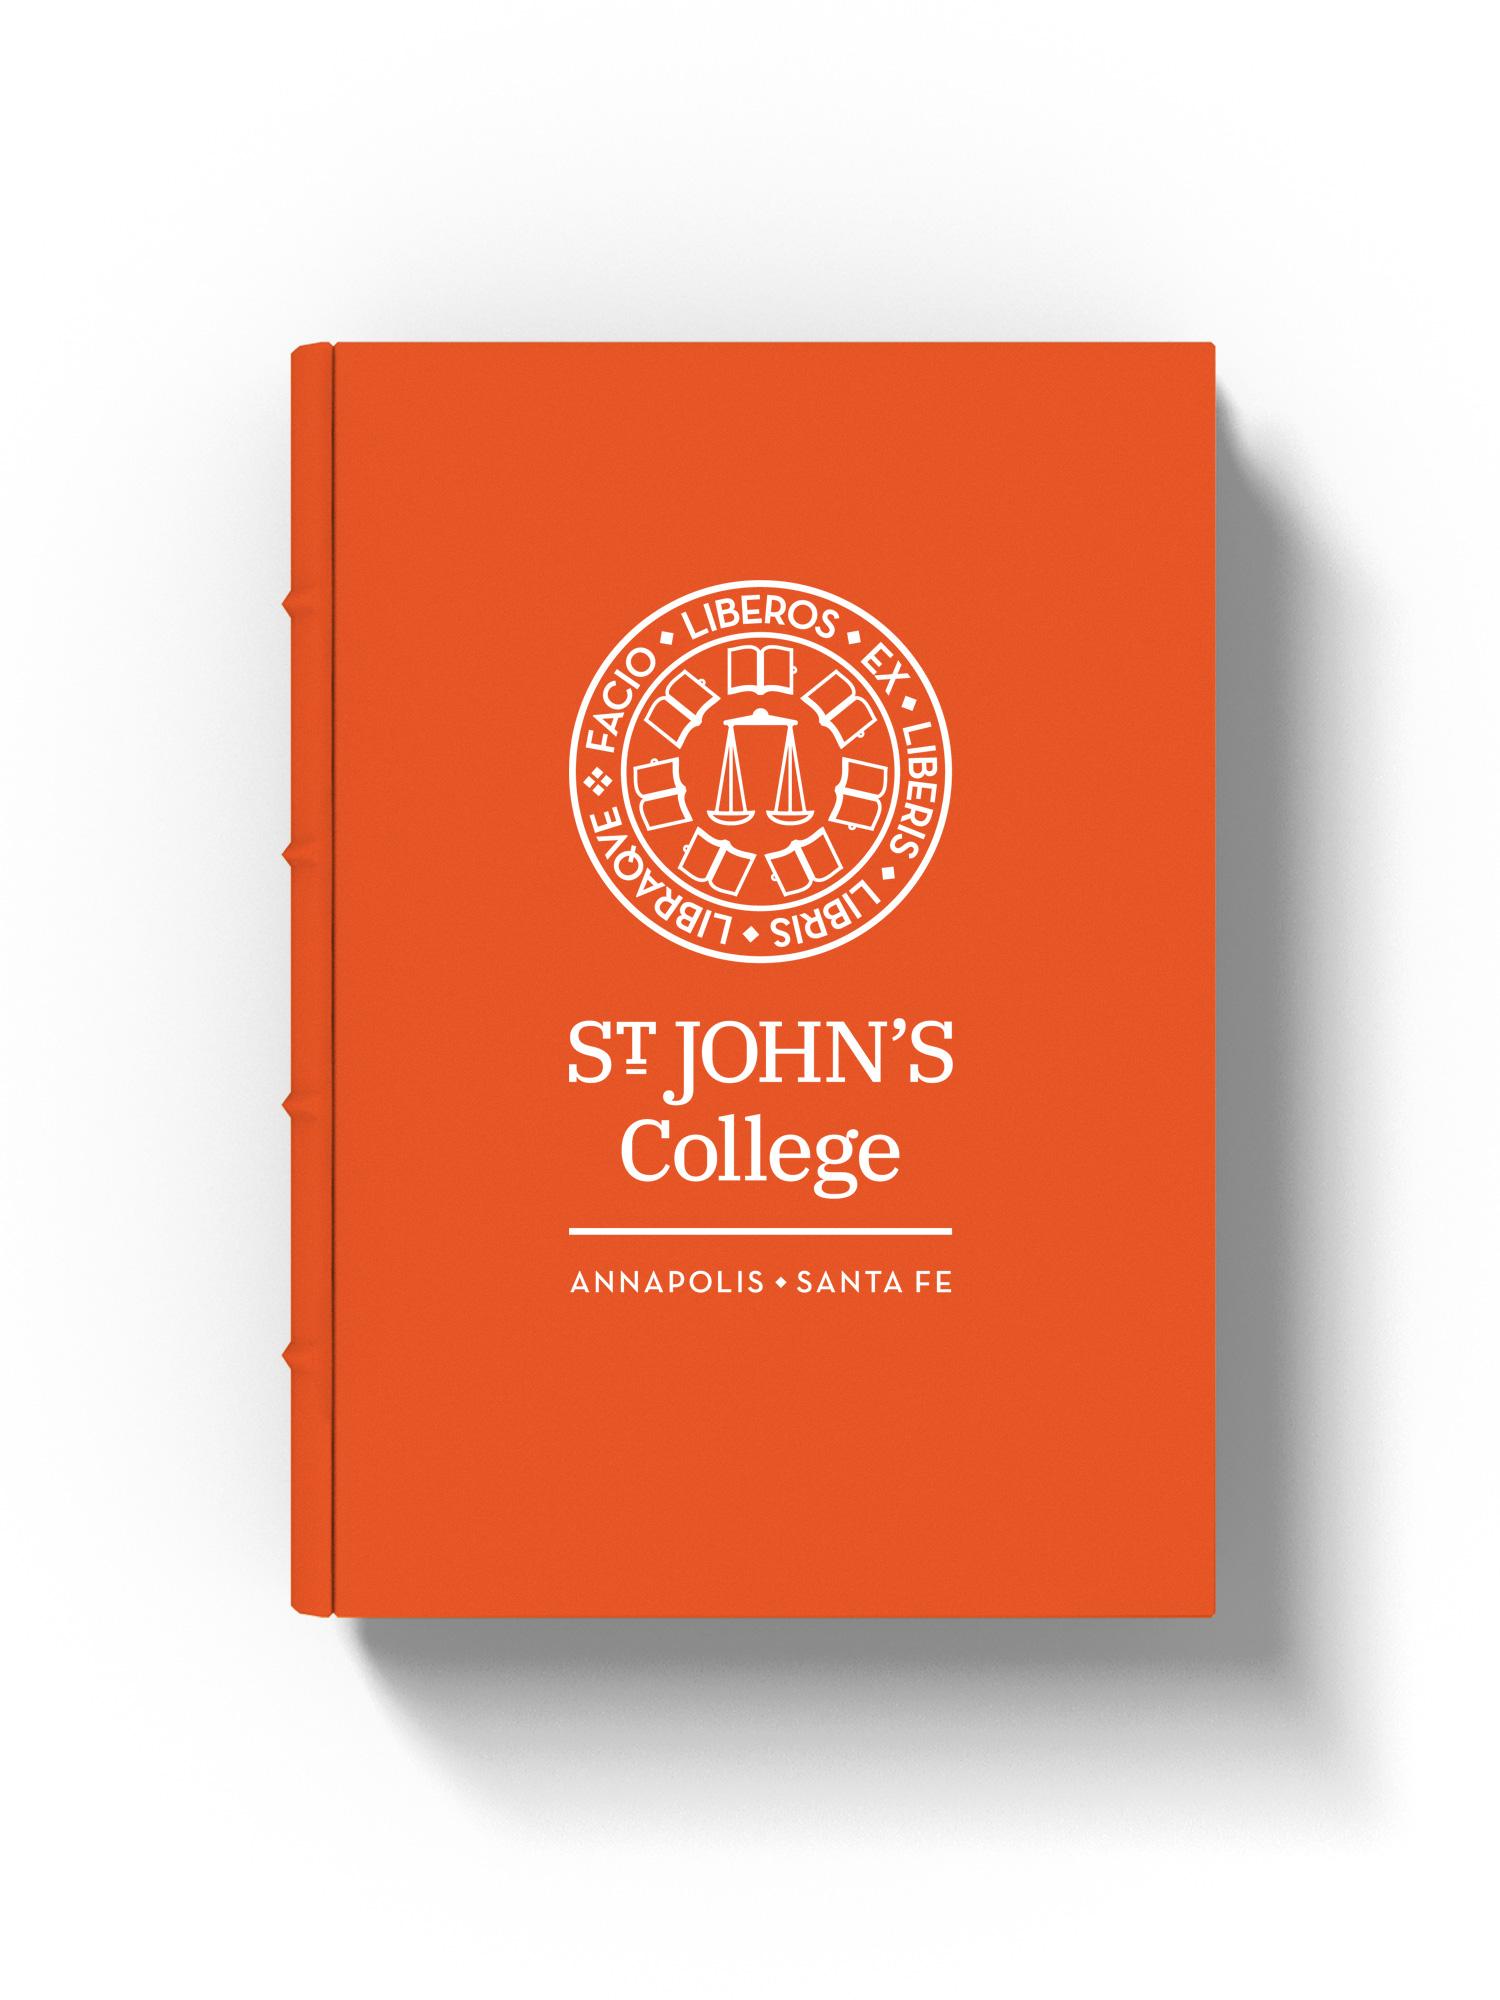 SJC_new_book_orange.jpg